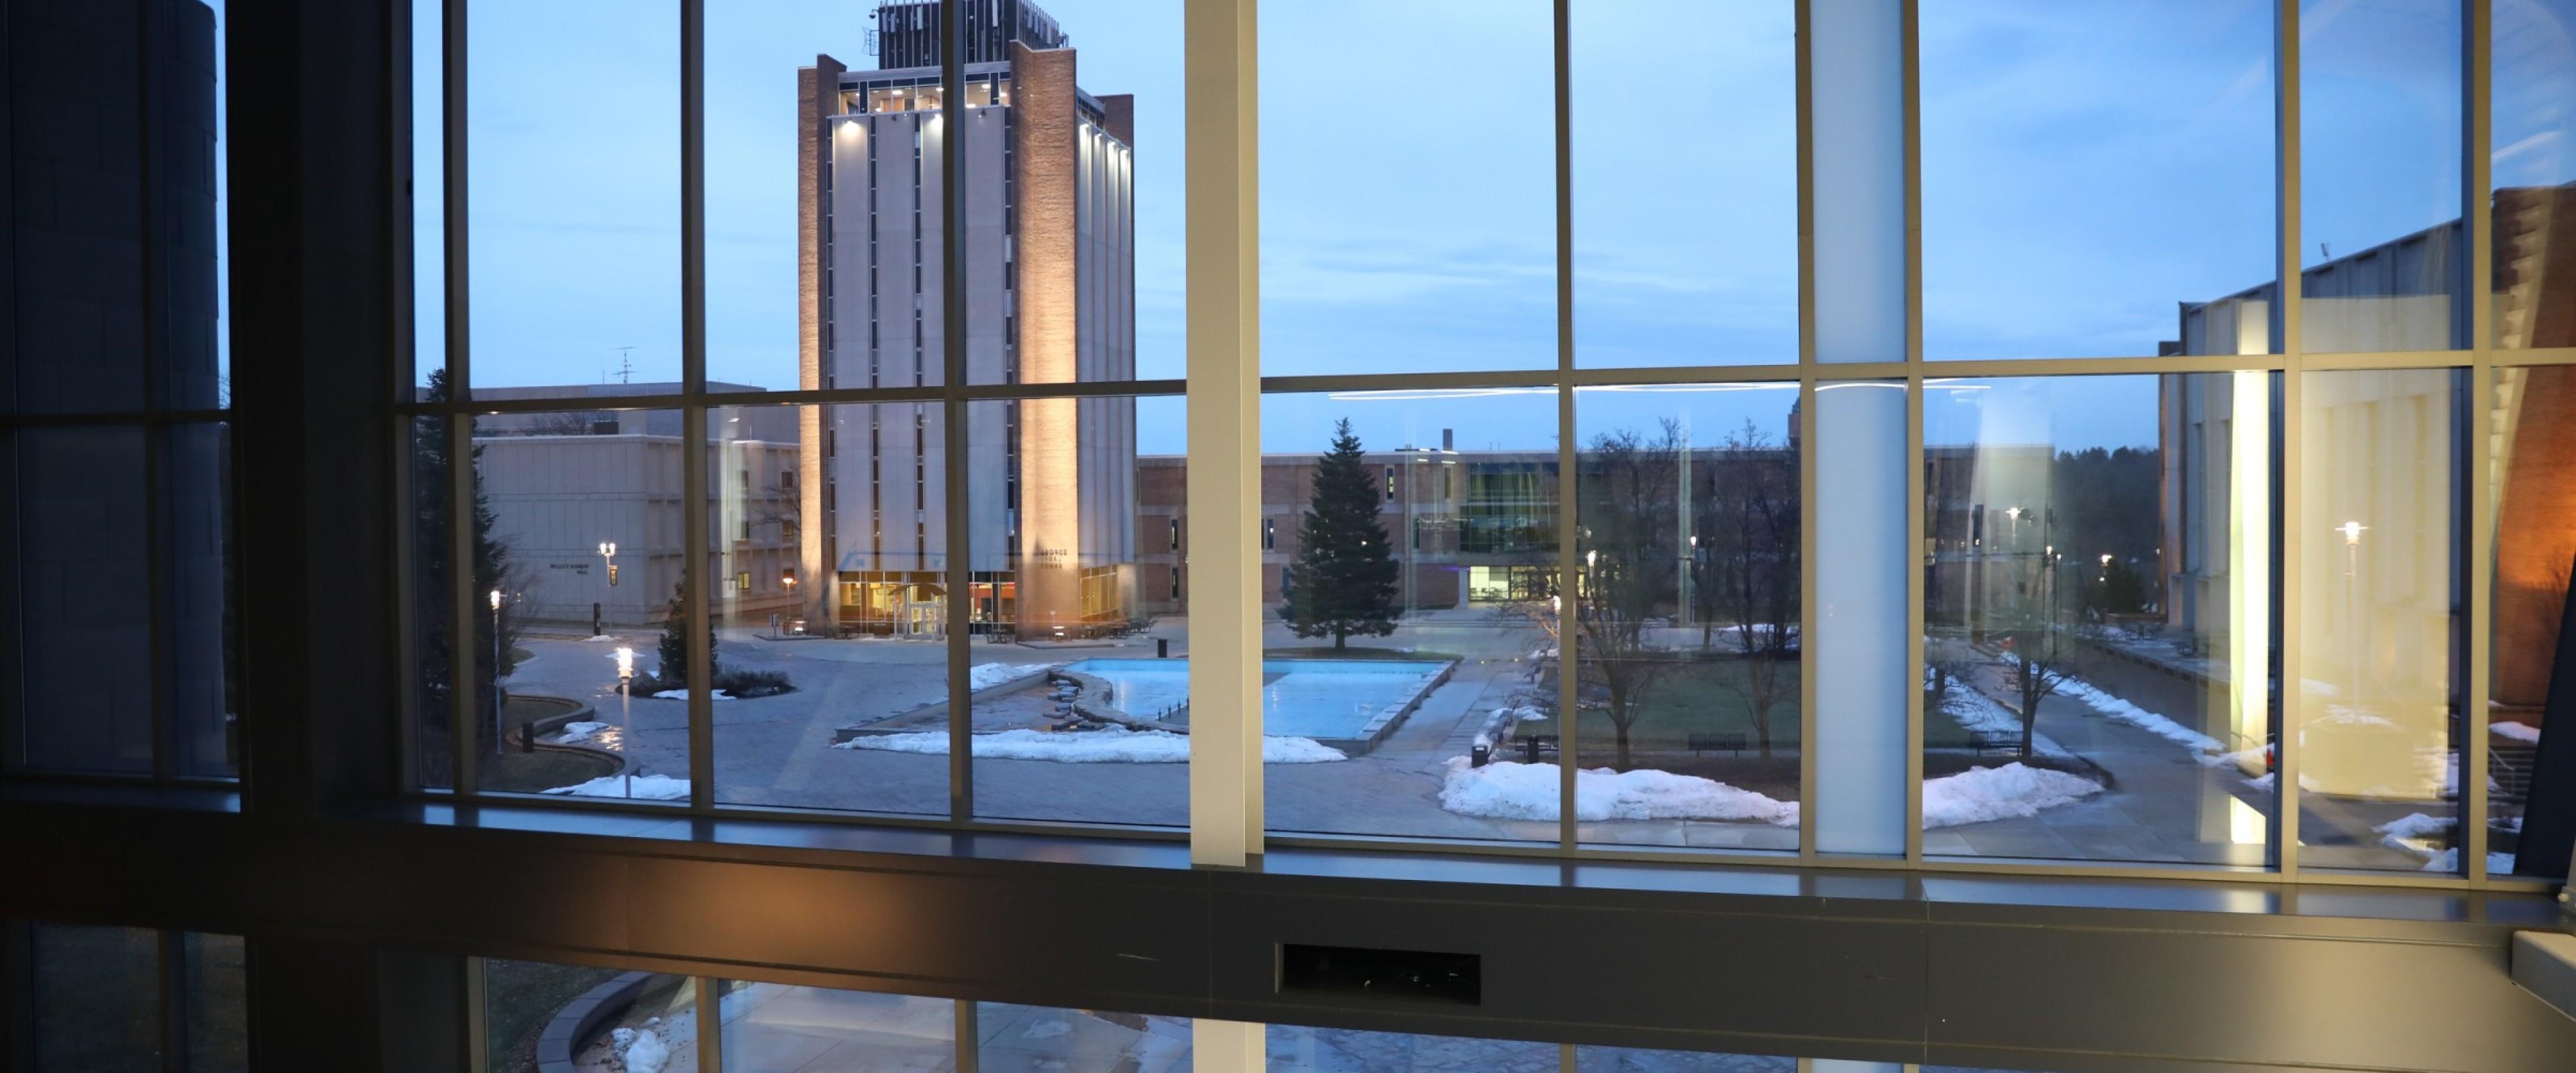 lobby of a building at dusk